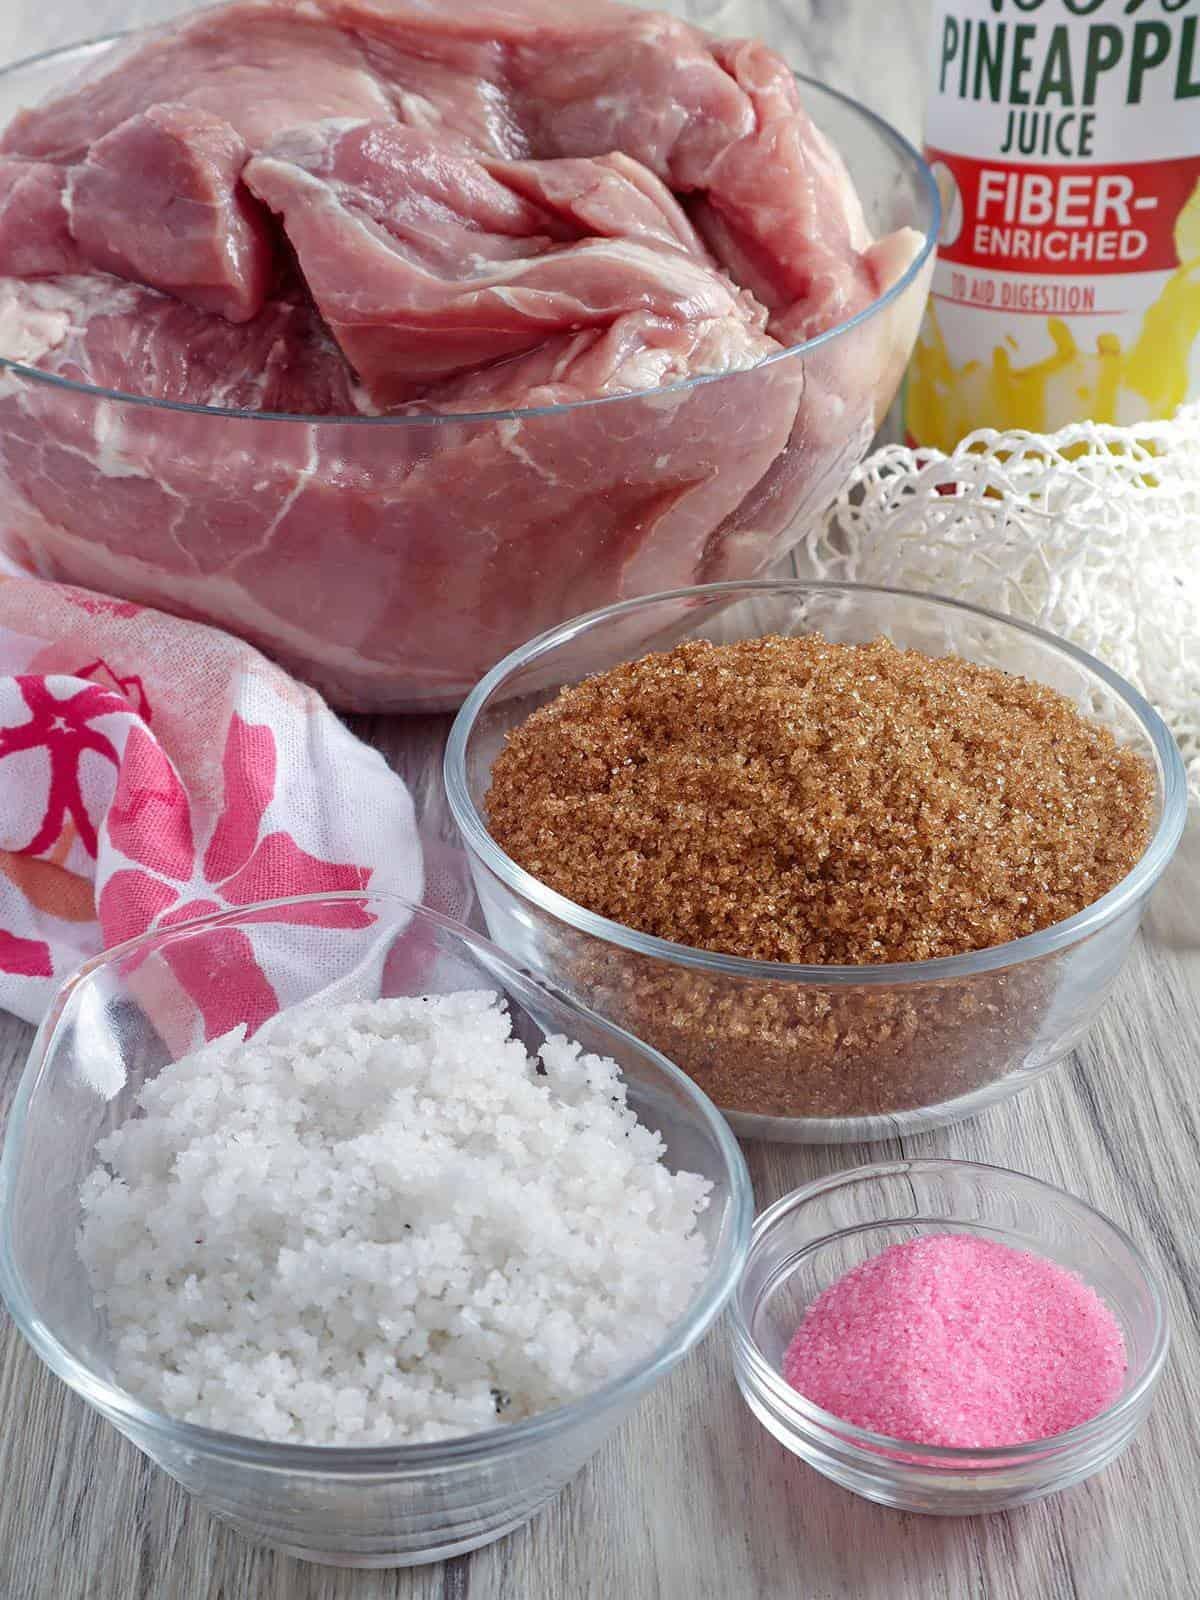 pork ham, brown sugar, rock salt, Prague salt in bowls and a can of Pineapple juice on the side